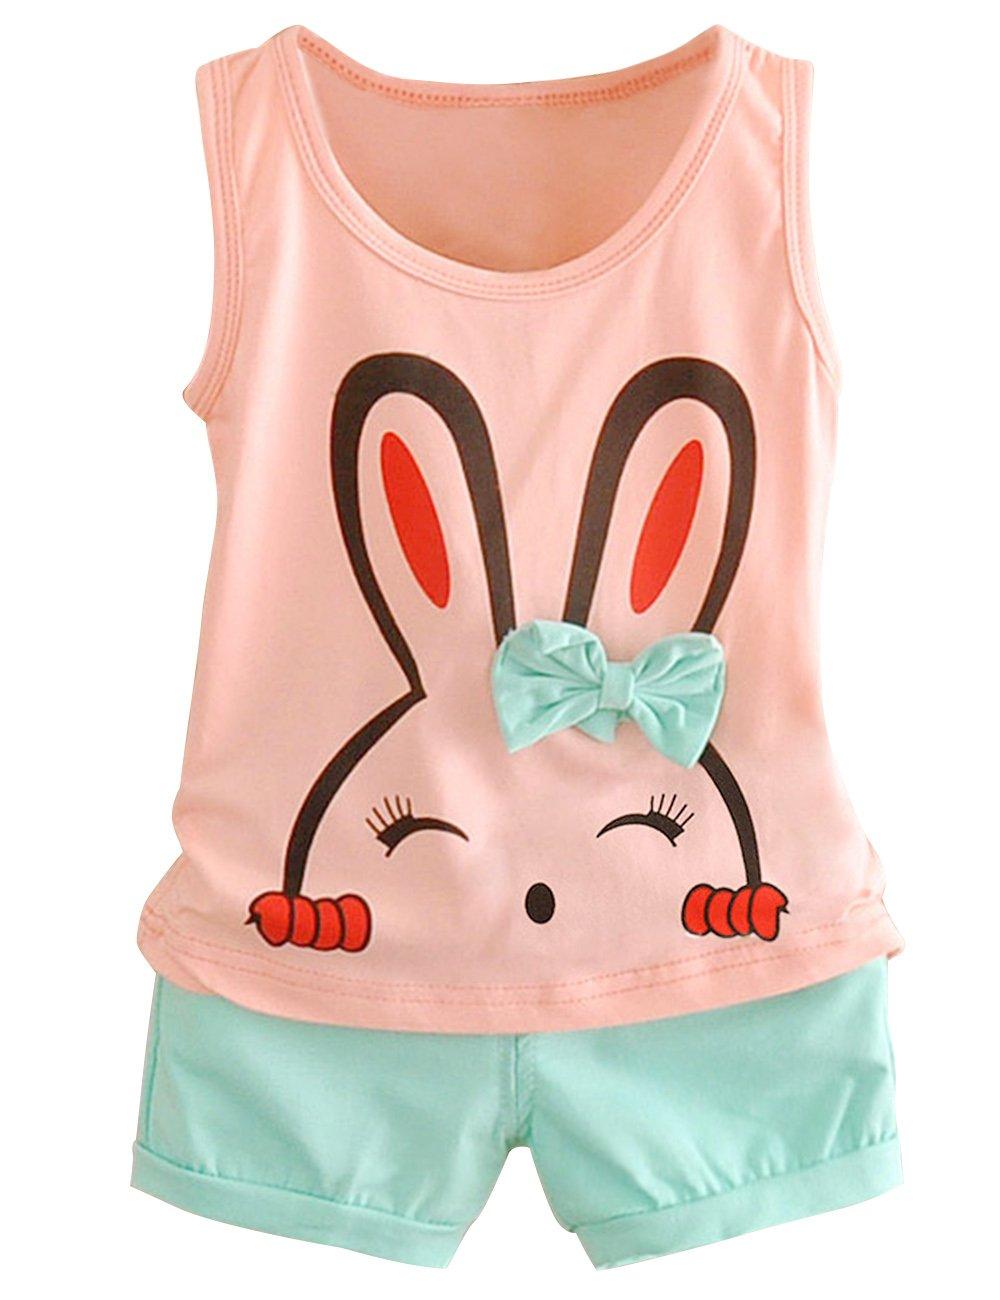 LaLaKid Baby Girls Rabbit Printed T-Shirt Shorts Set Outfits Pink 2-3Y